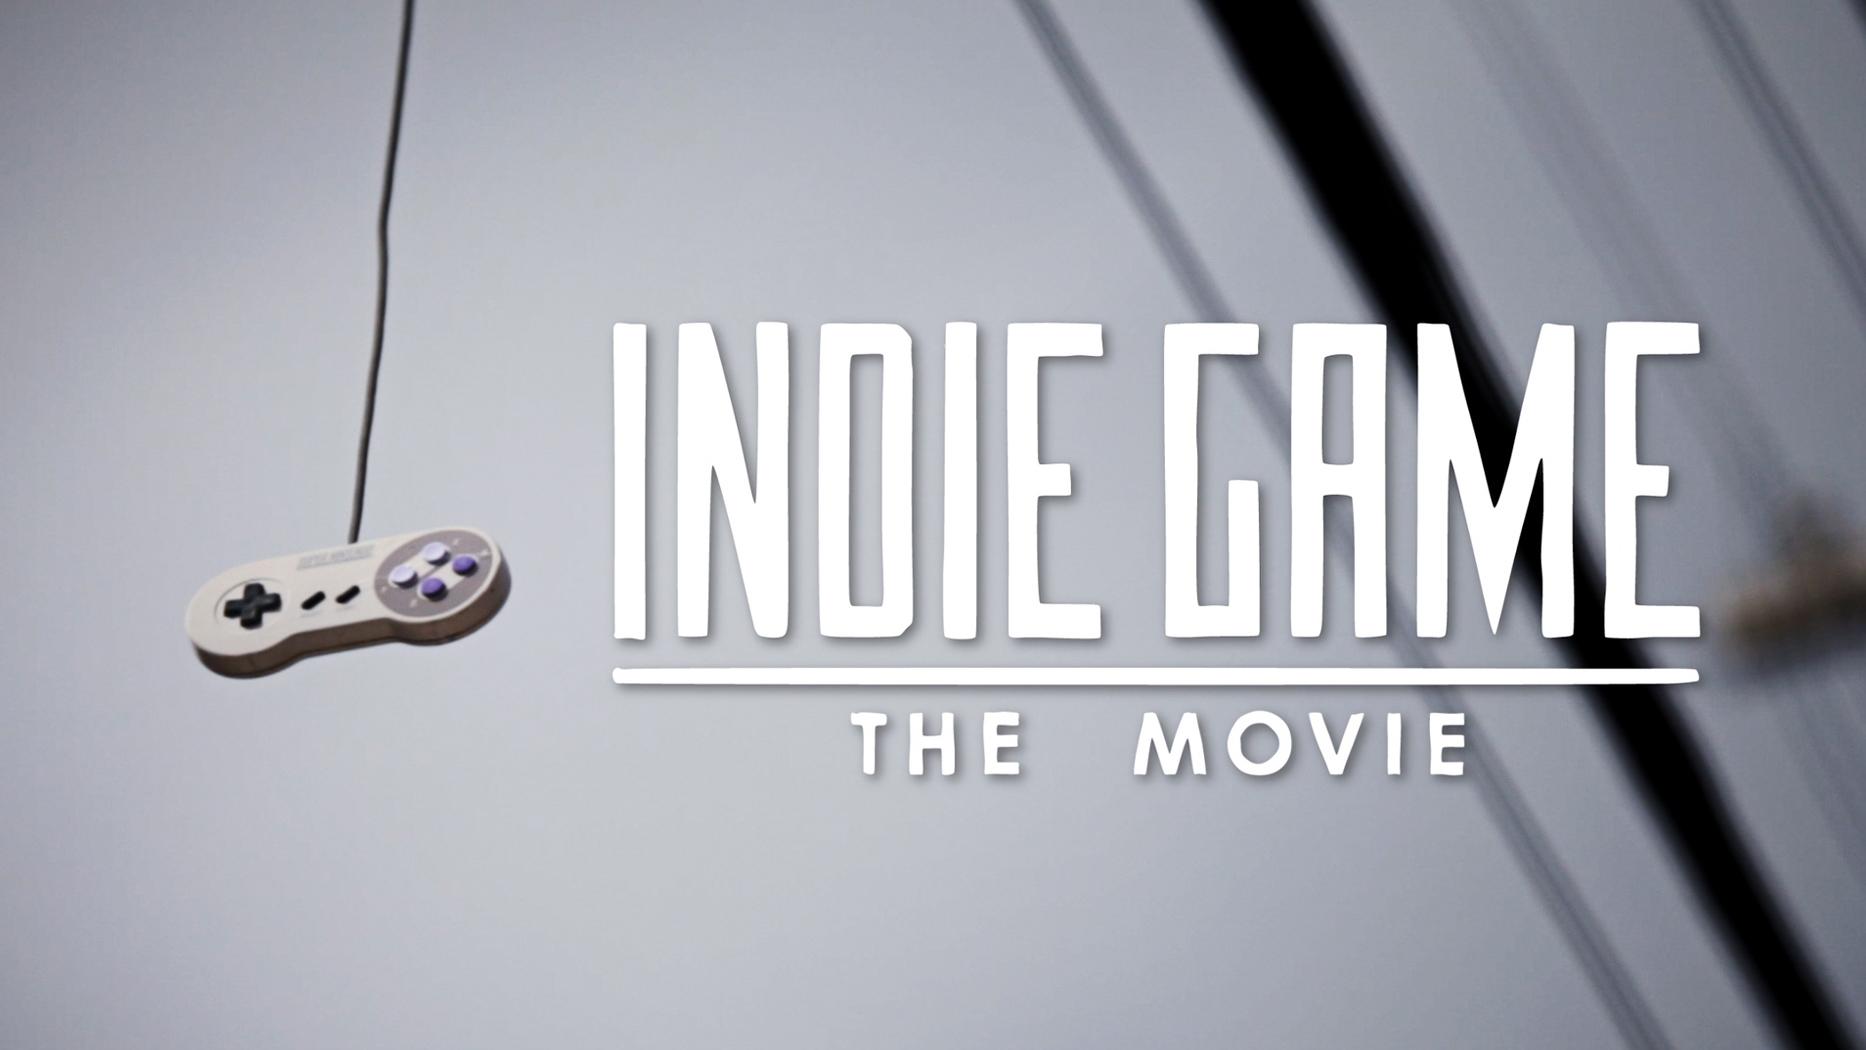 https://i0.wp.com/www.chud.com/wp-content/uploads/2012/05/Indie-Game-the-movie-2.jpeg